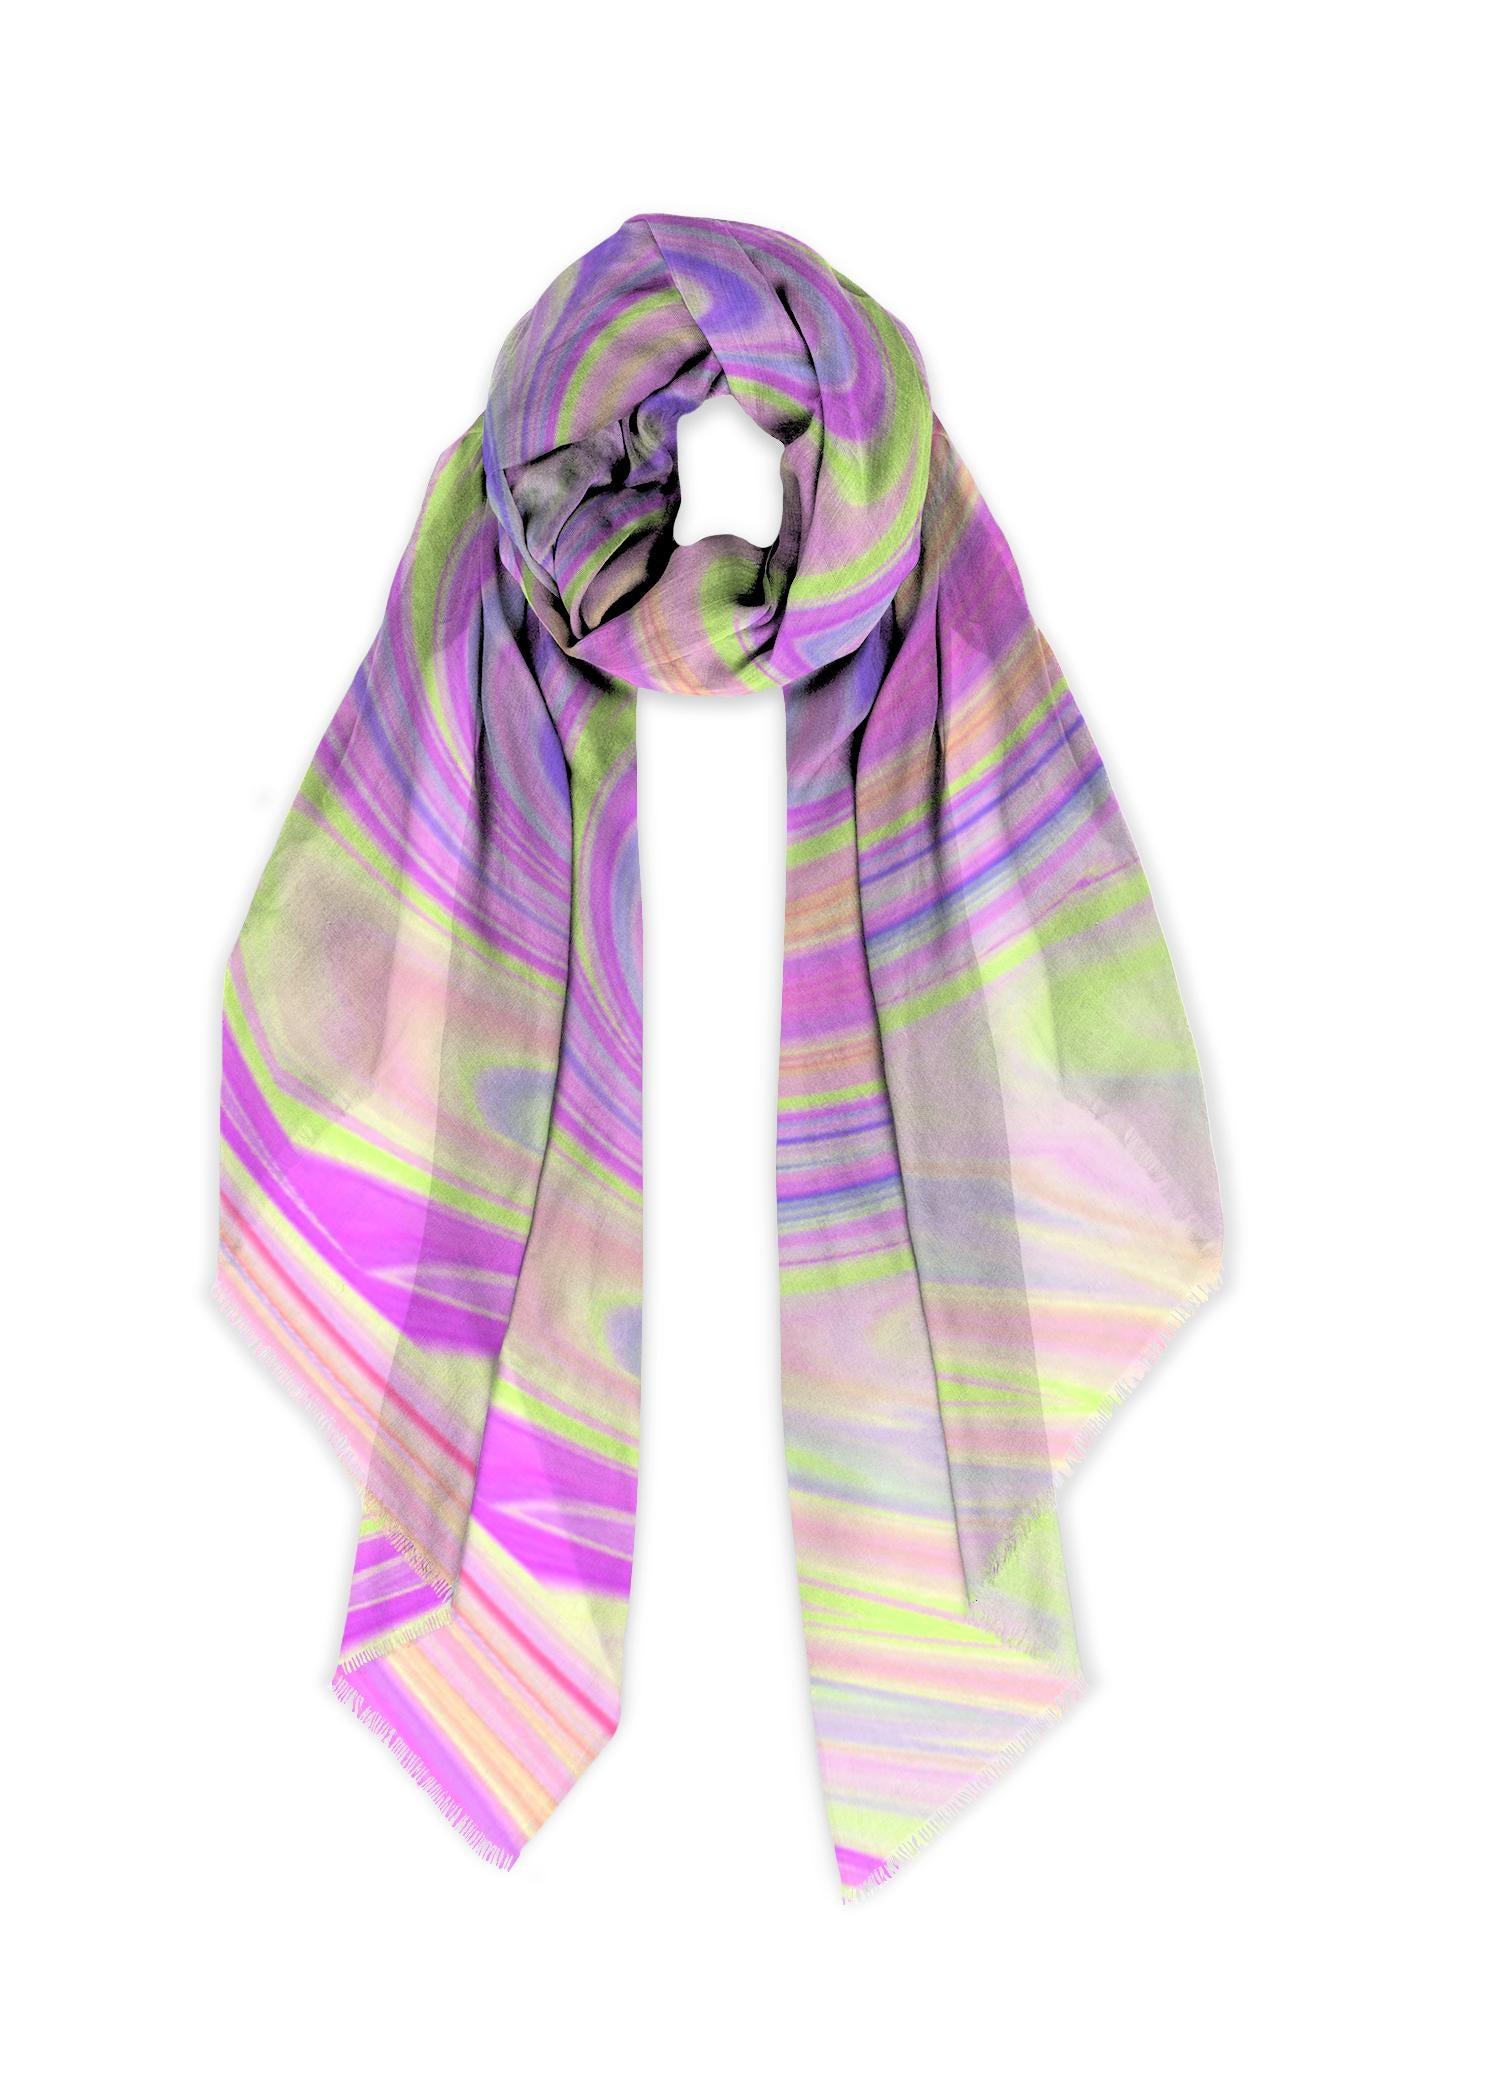 VIDA Modal Scarf - Fashion Waves in Pink/Purple/Yellow by VIDA Original Artist  - Size: One Size